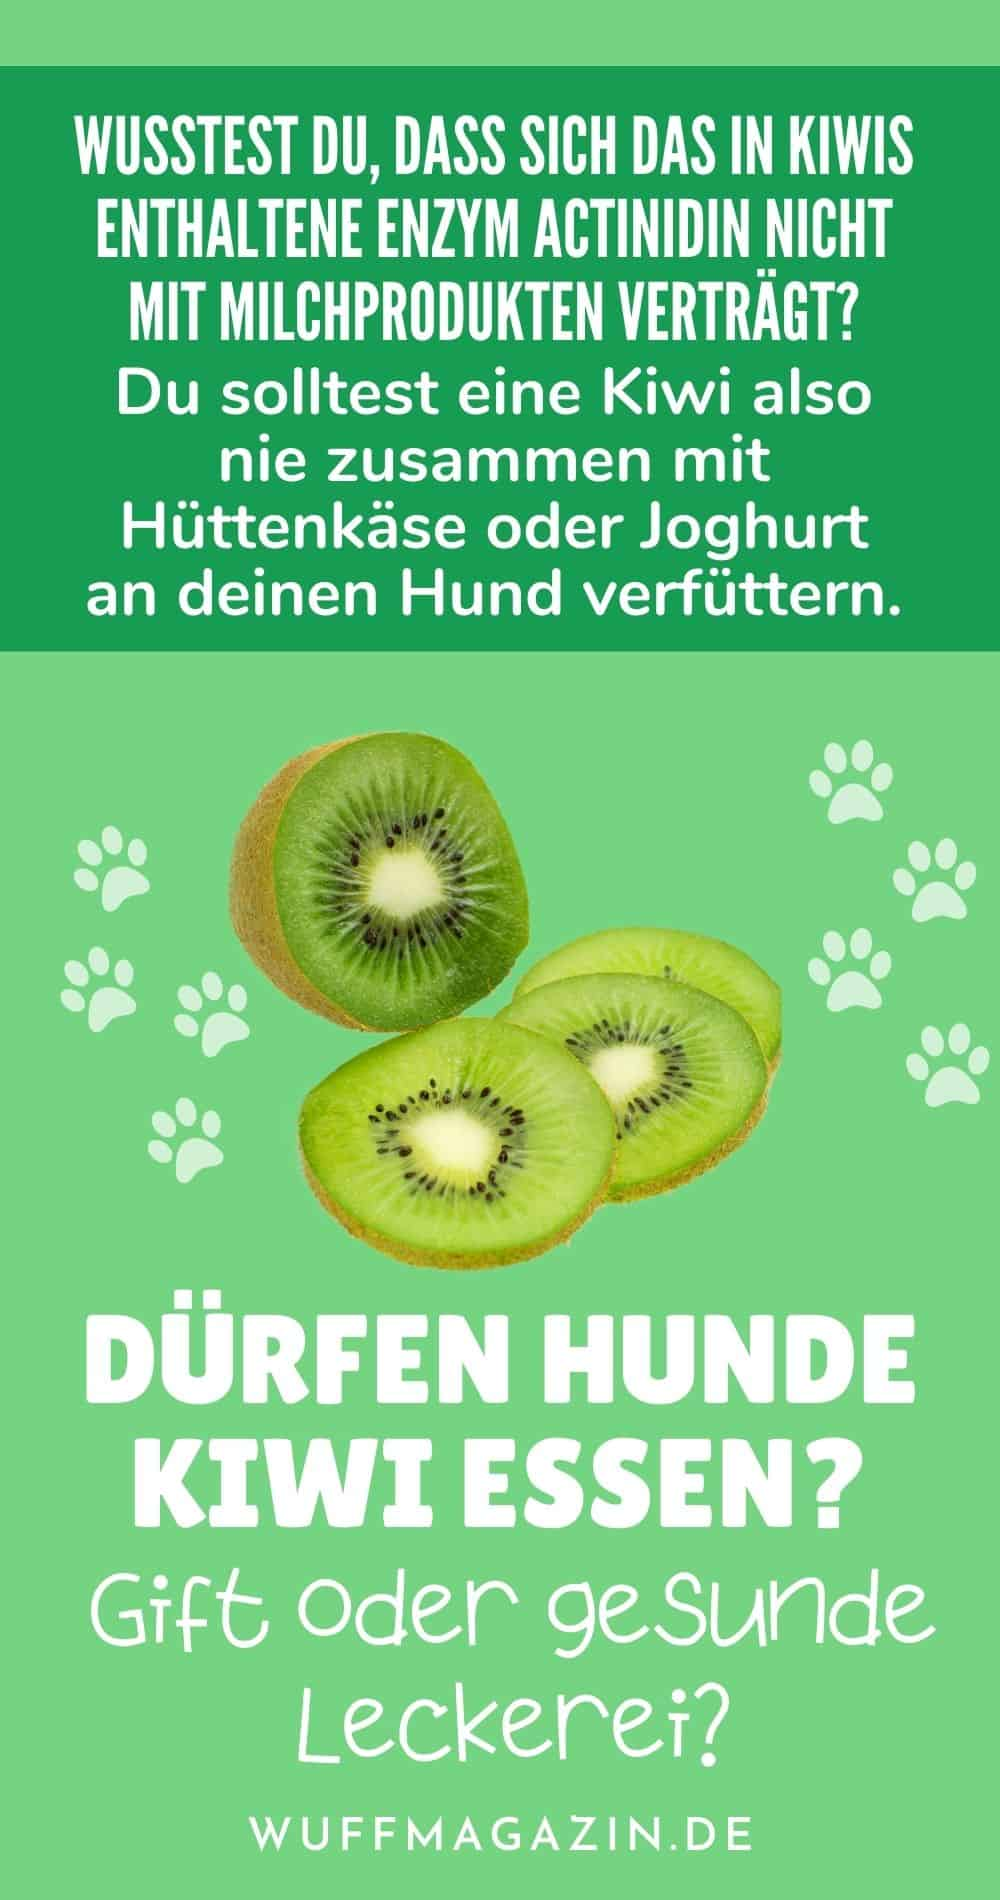 Dürfen Hunde Kiwi essen Gift oder gesunde Leckerei